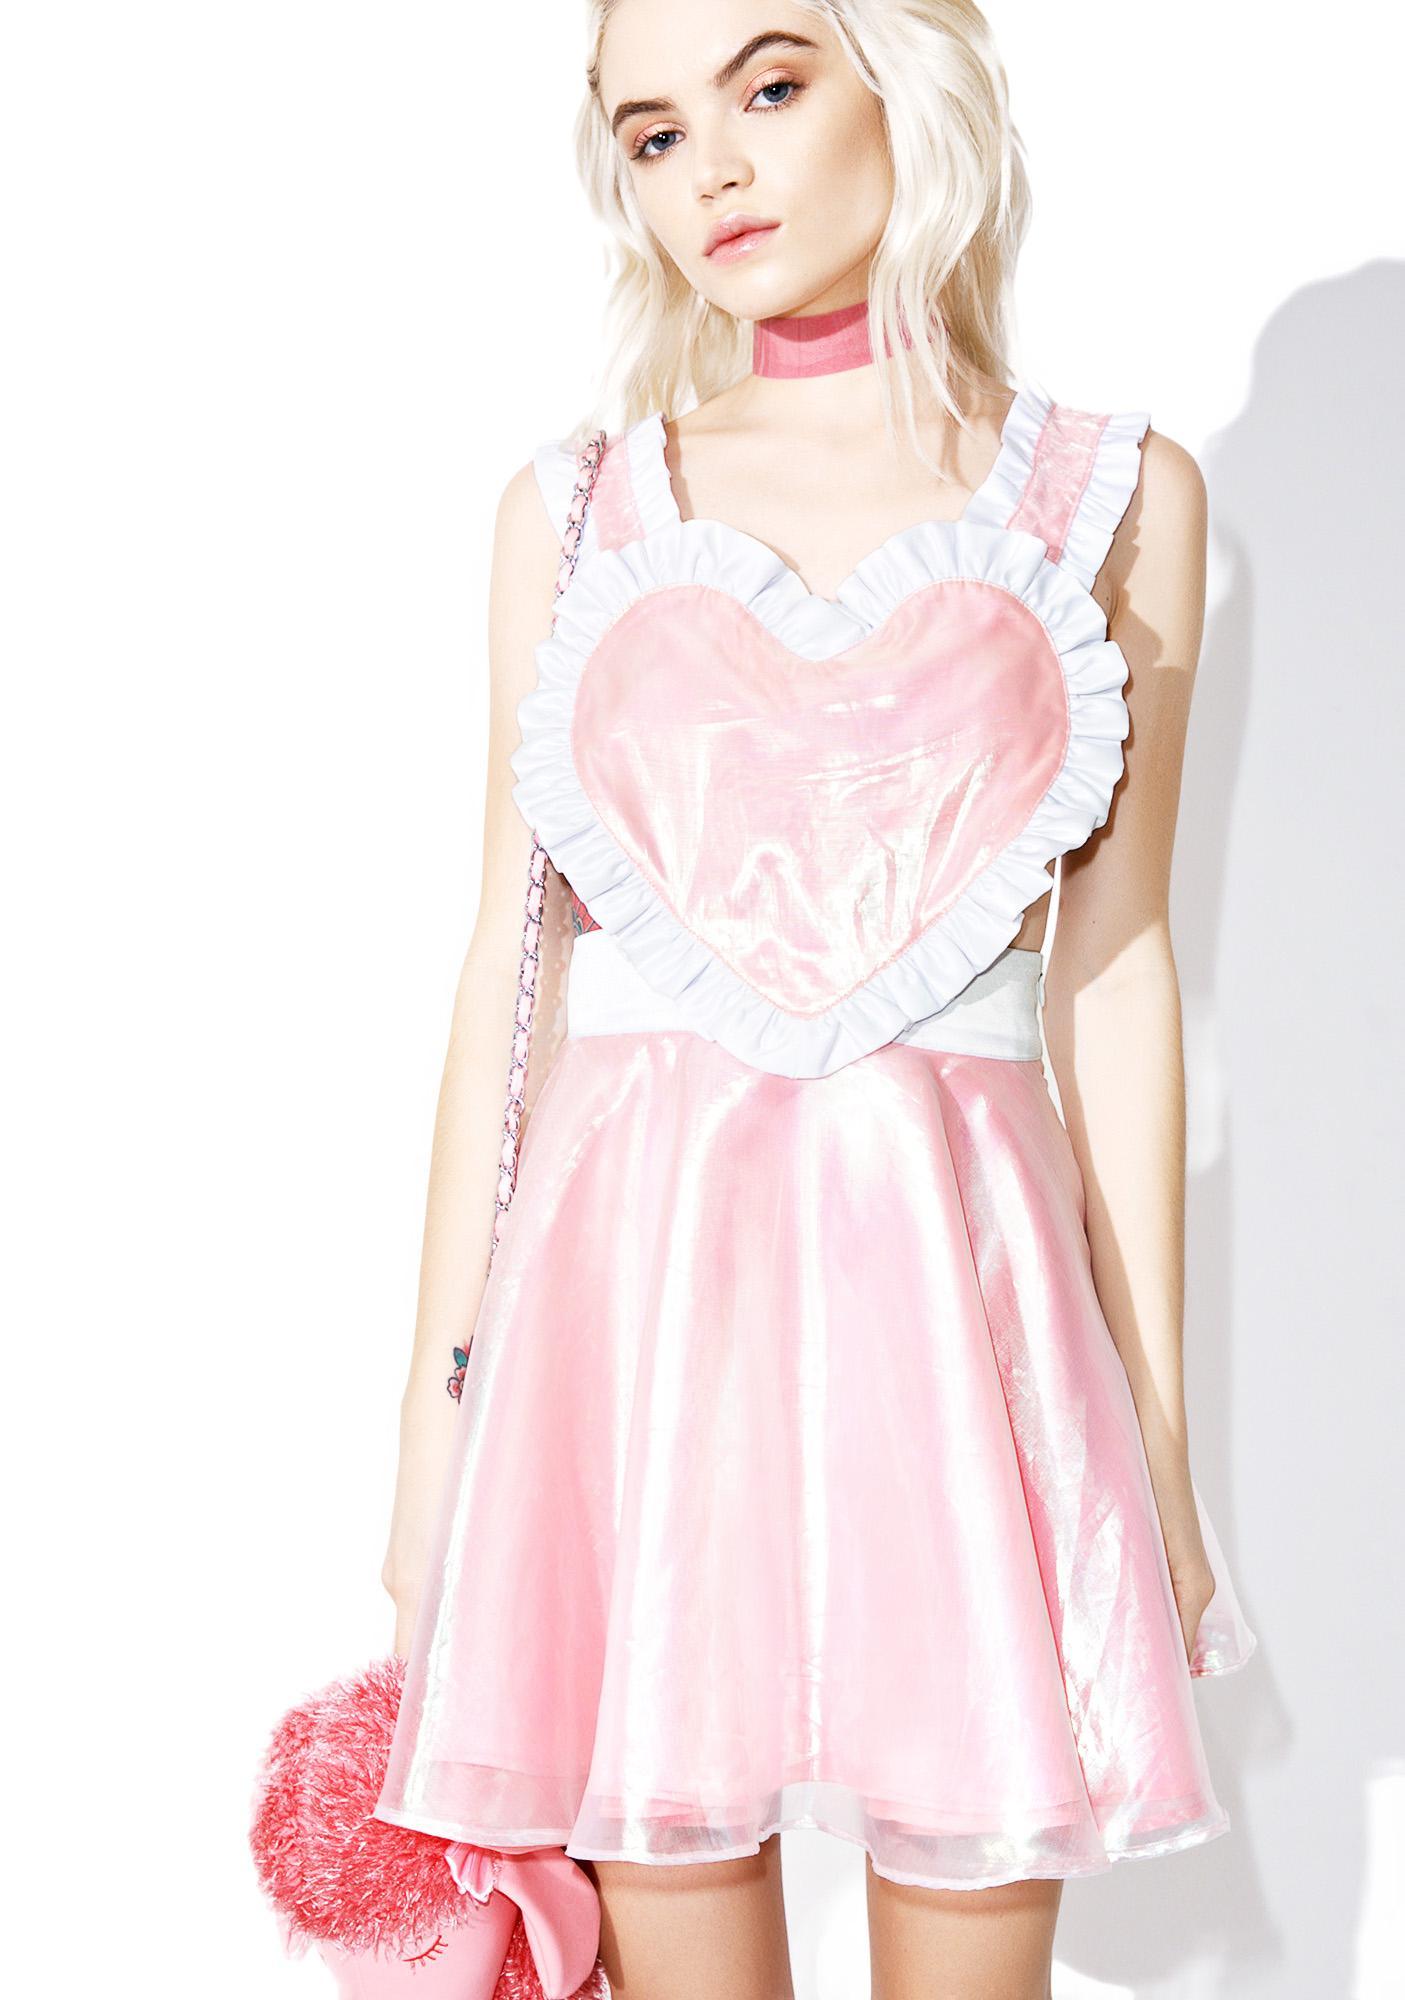 Chrissa Sparkles Be Still, My Heart Dress